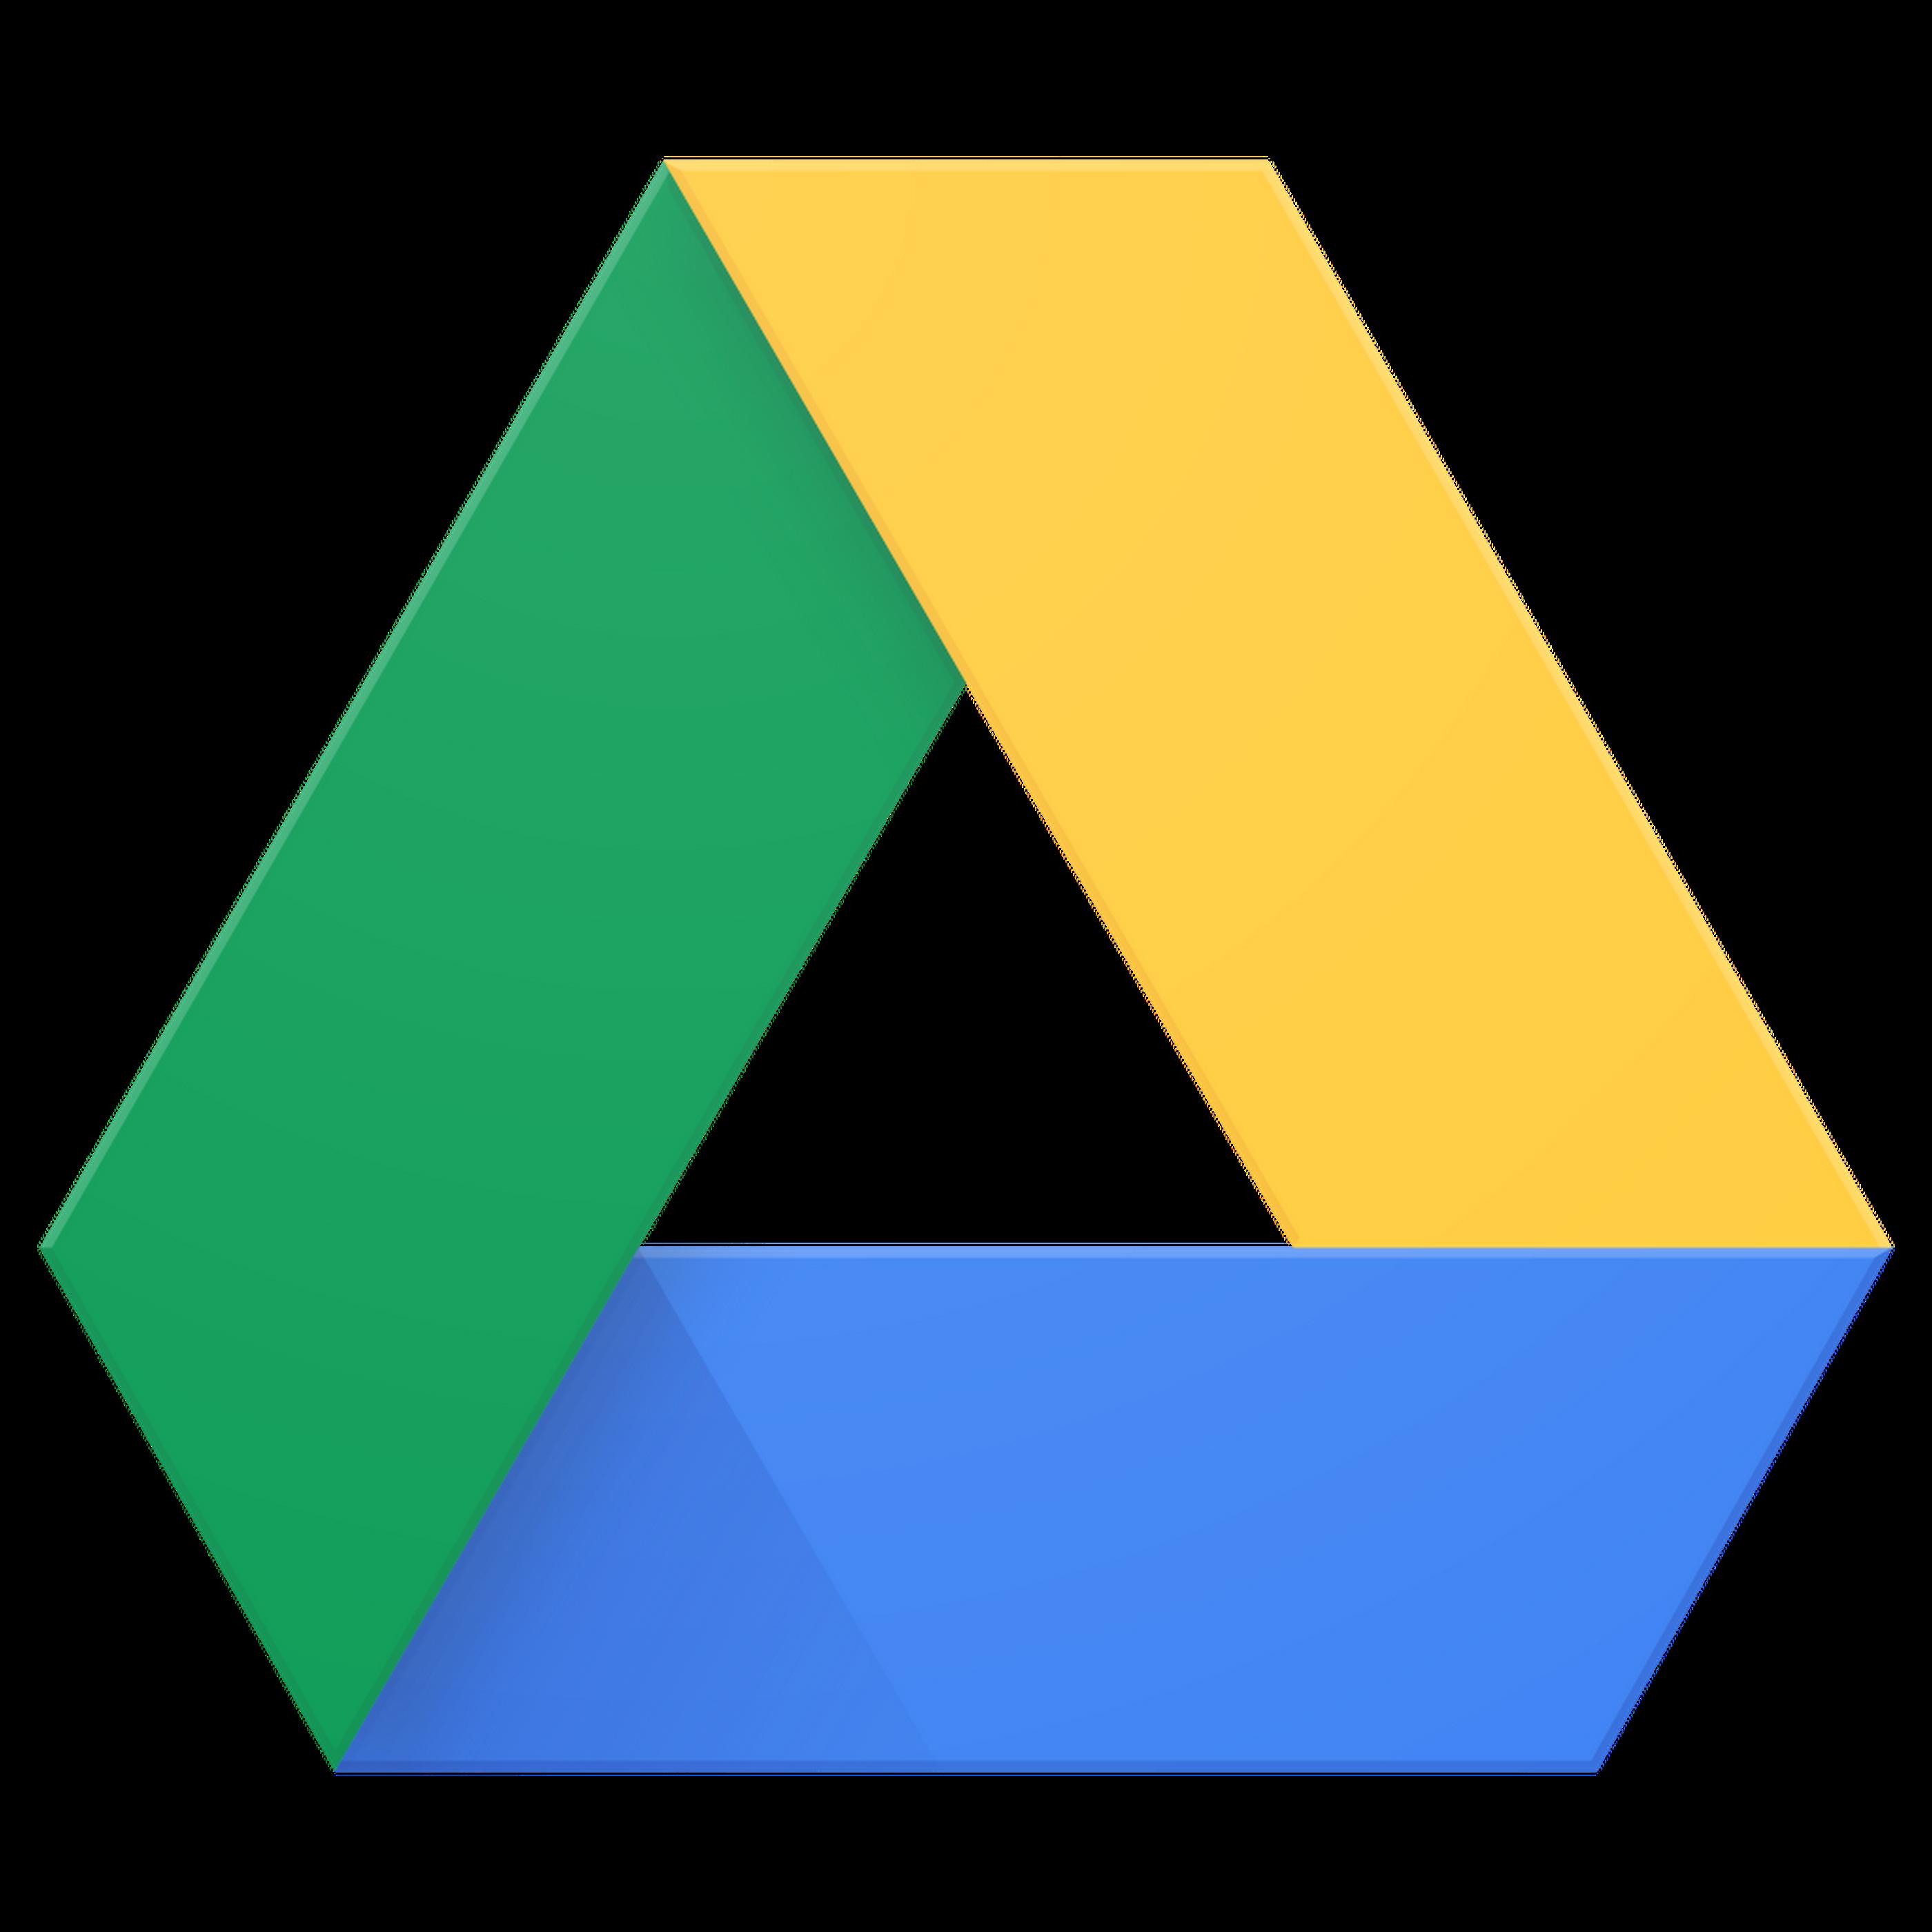 Google Drive Aplicaciones De Fotografia Iconos De Redes Sociales Google Drive